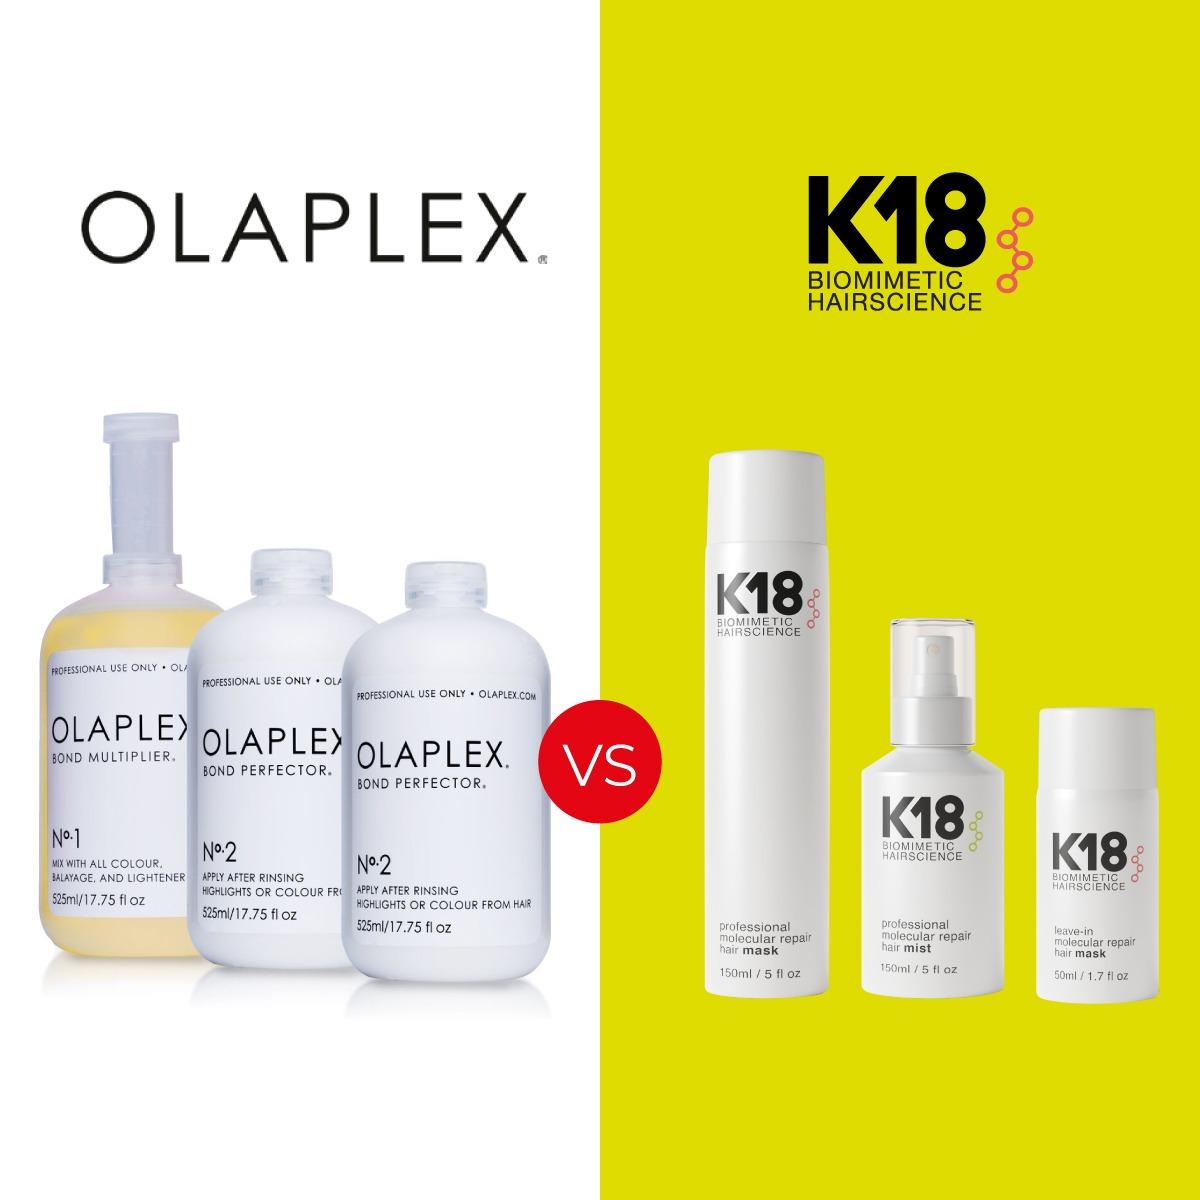 rigenerazione-capillare-olaplex-k18.jpg